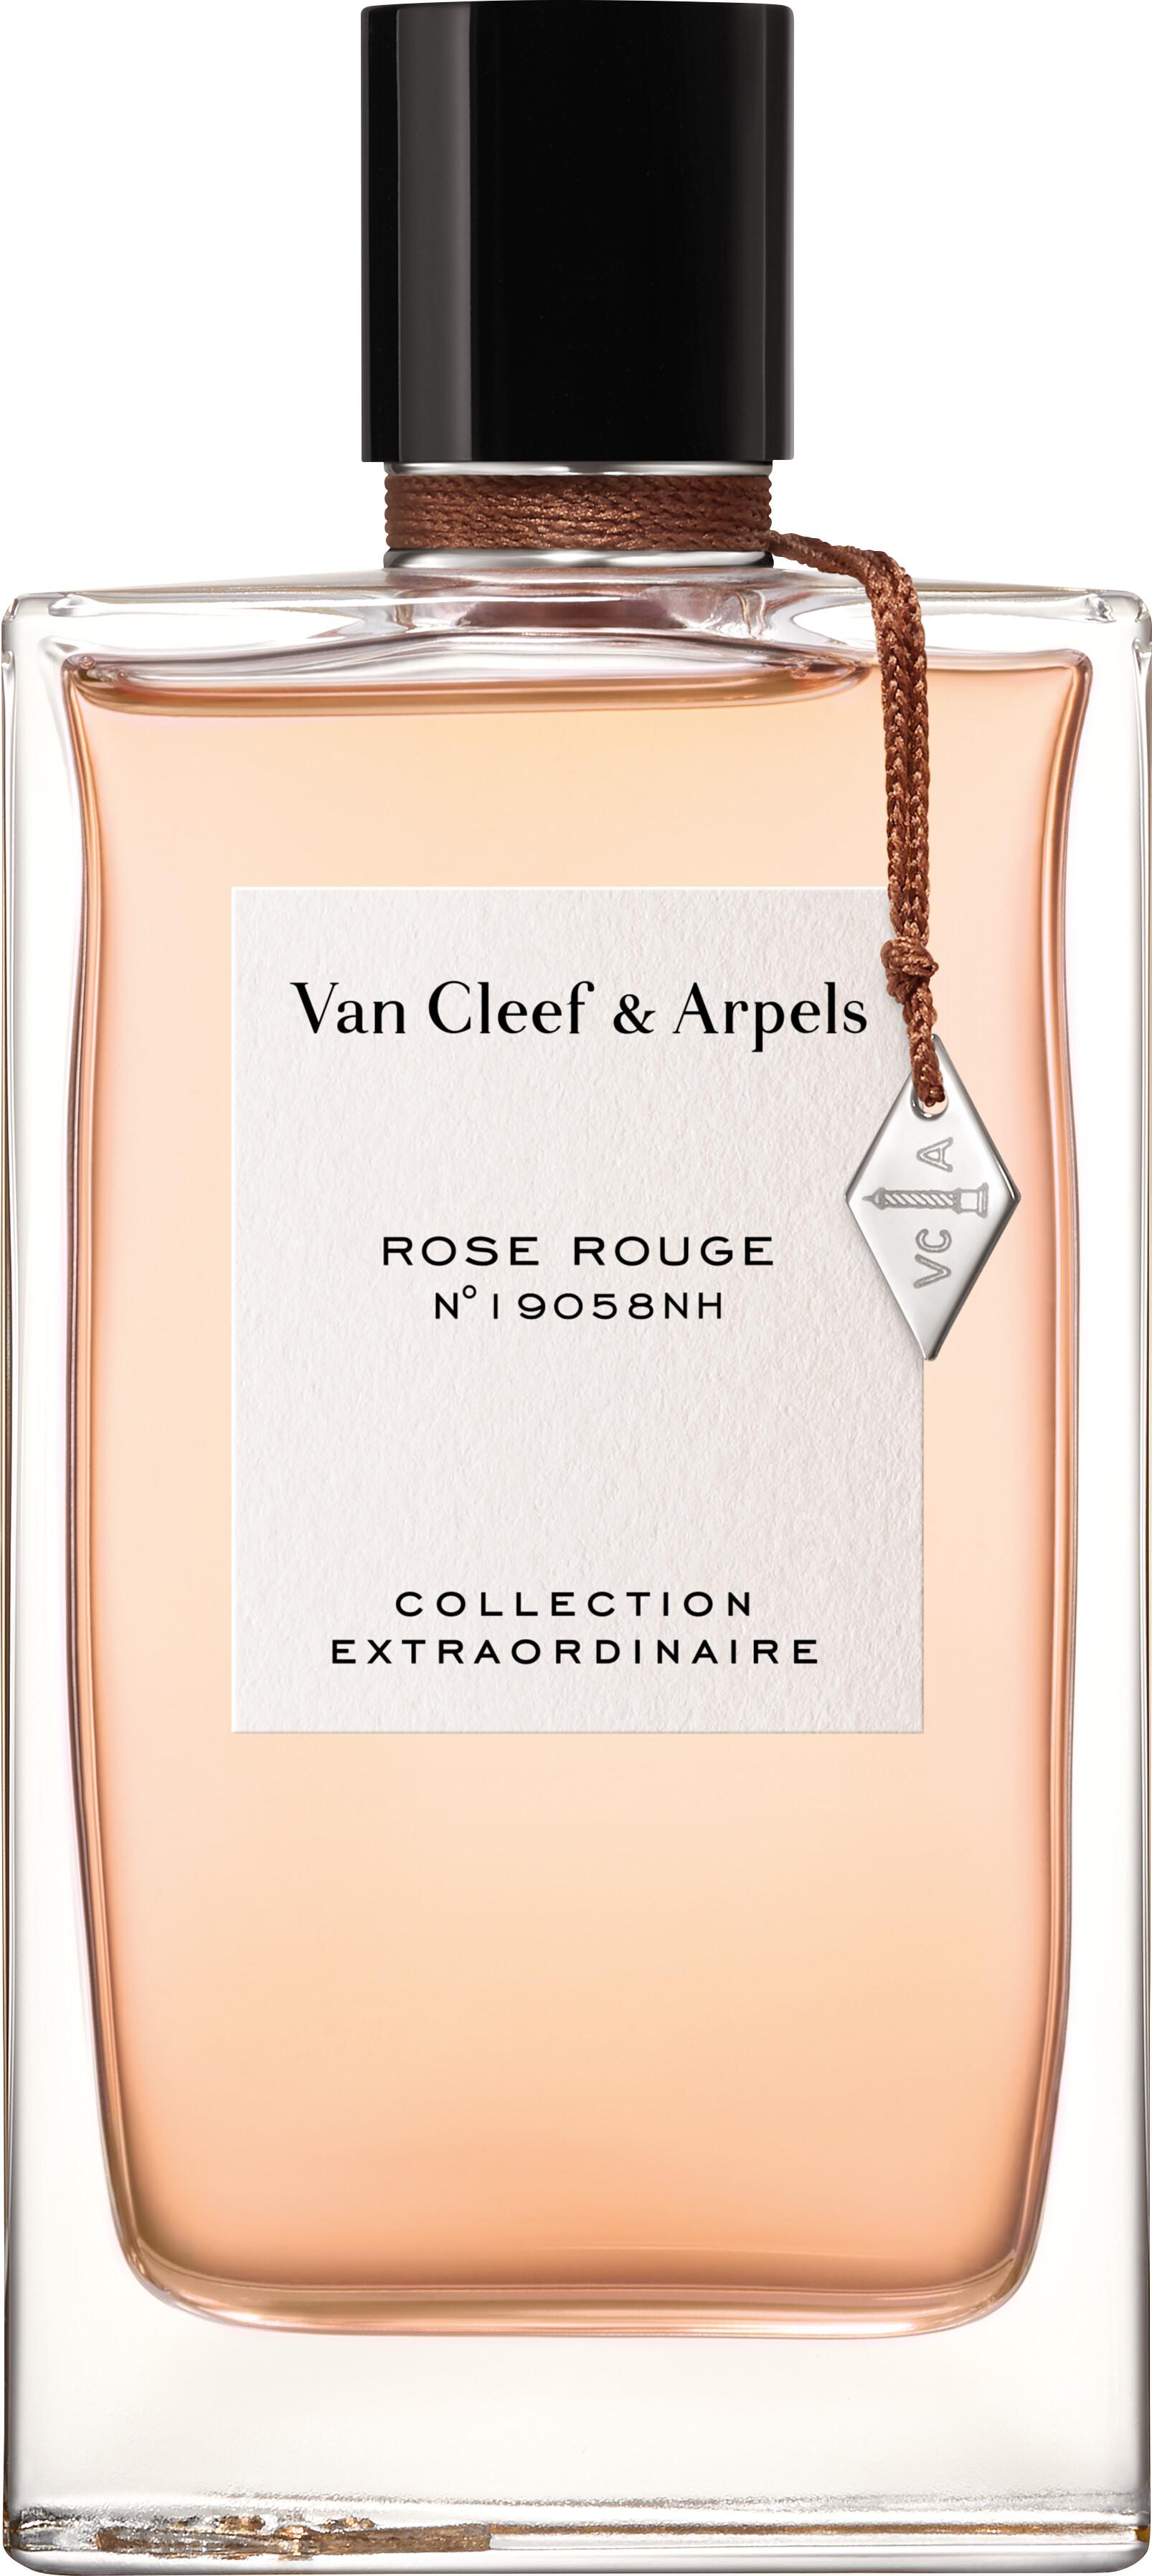 Van Cleef Arpels Collection Extraordinaire Rose Rouge Eau De